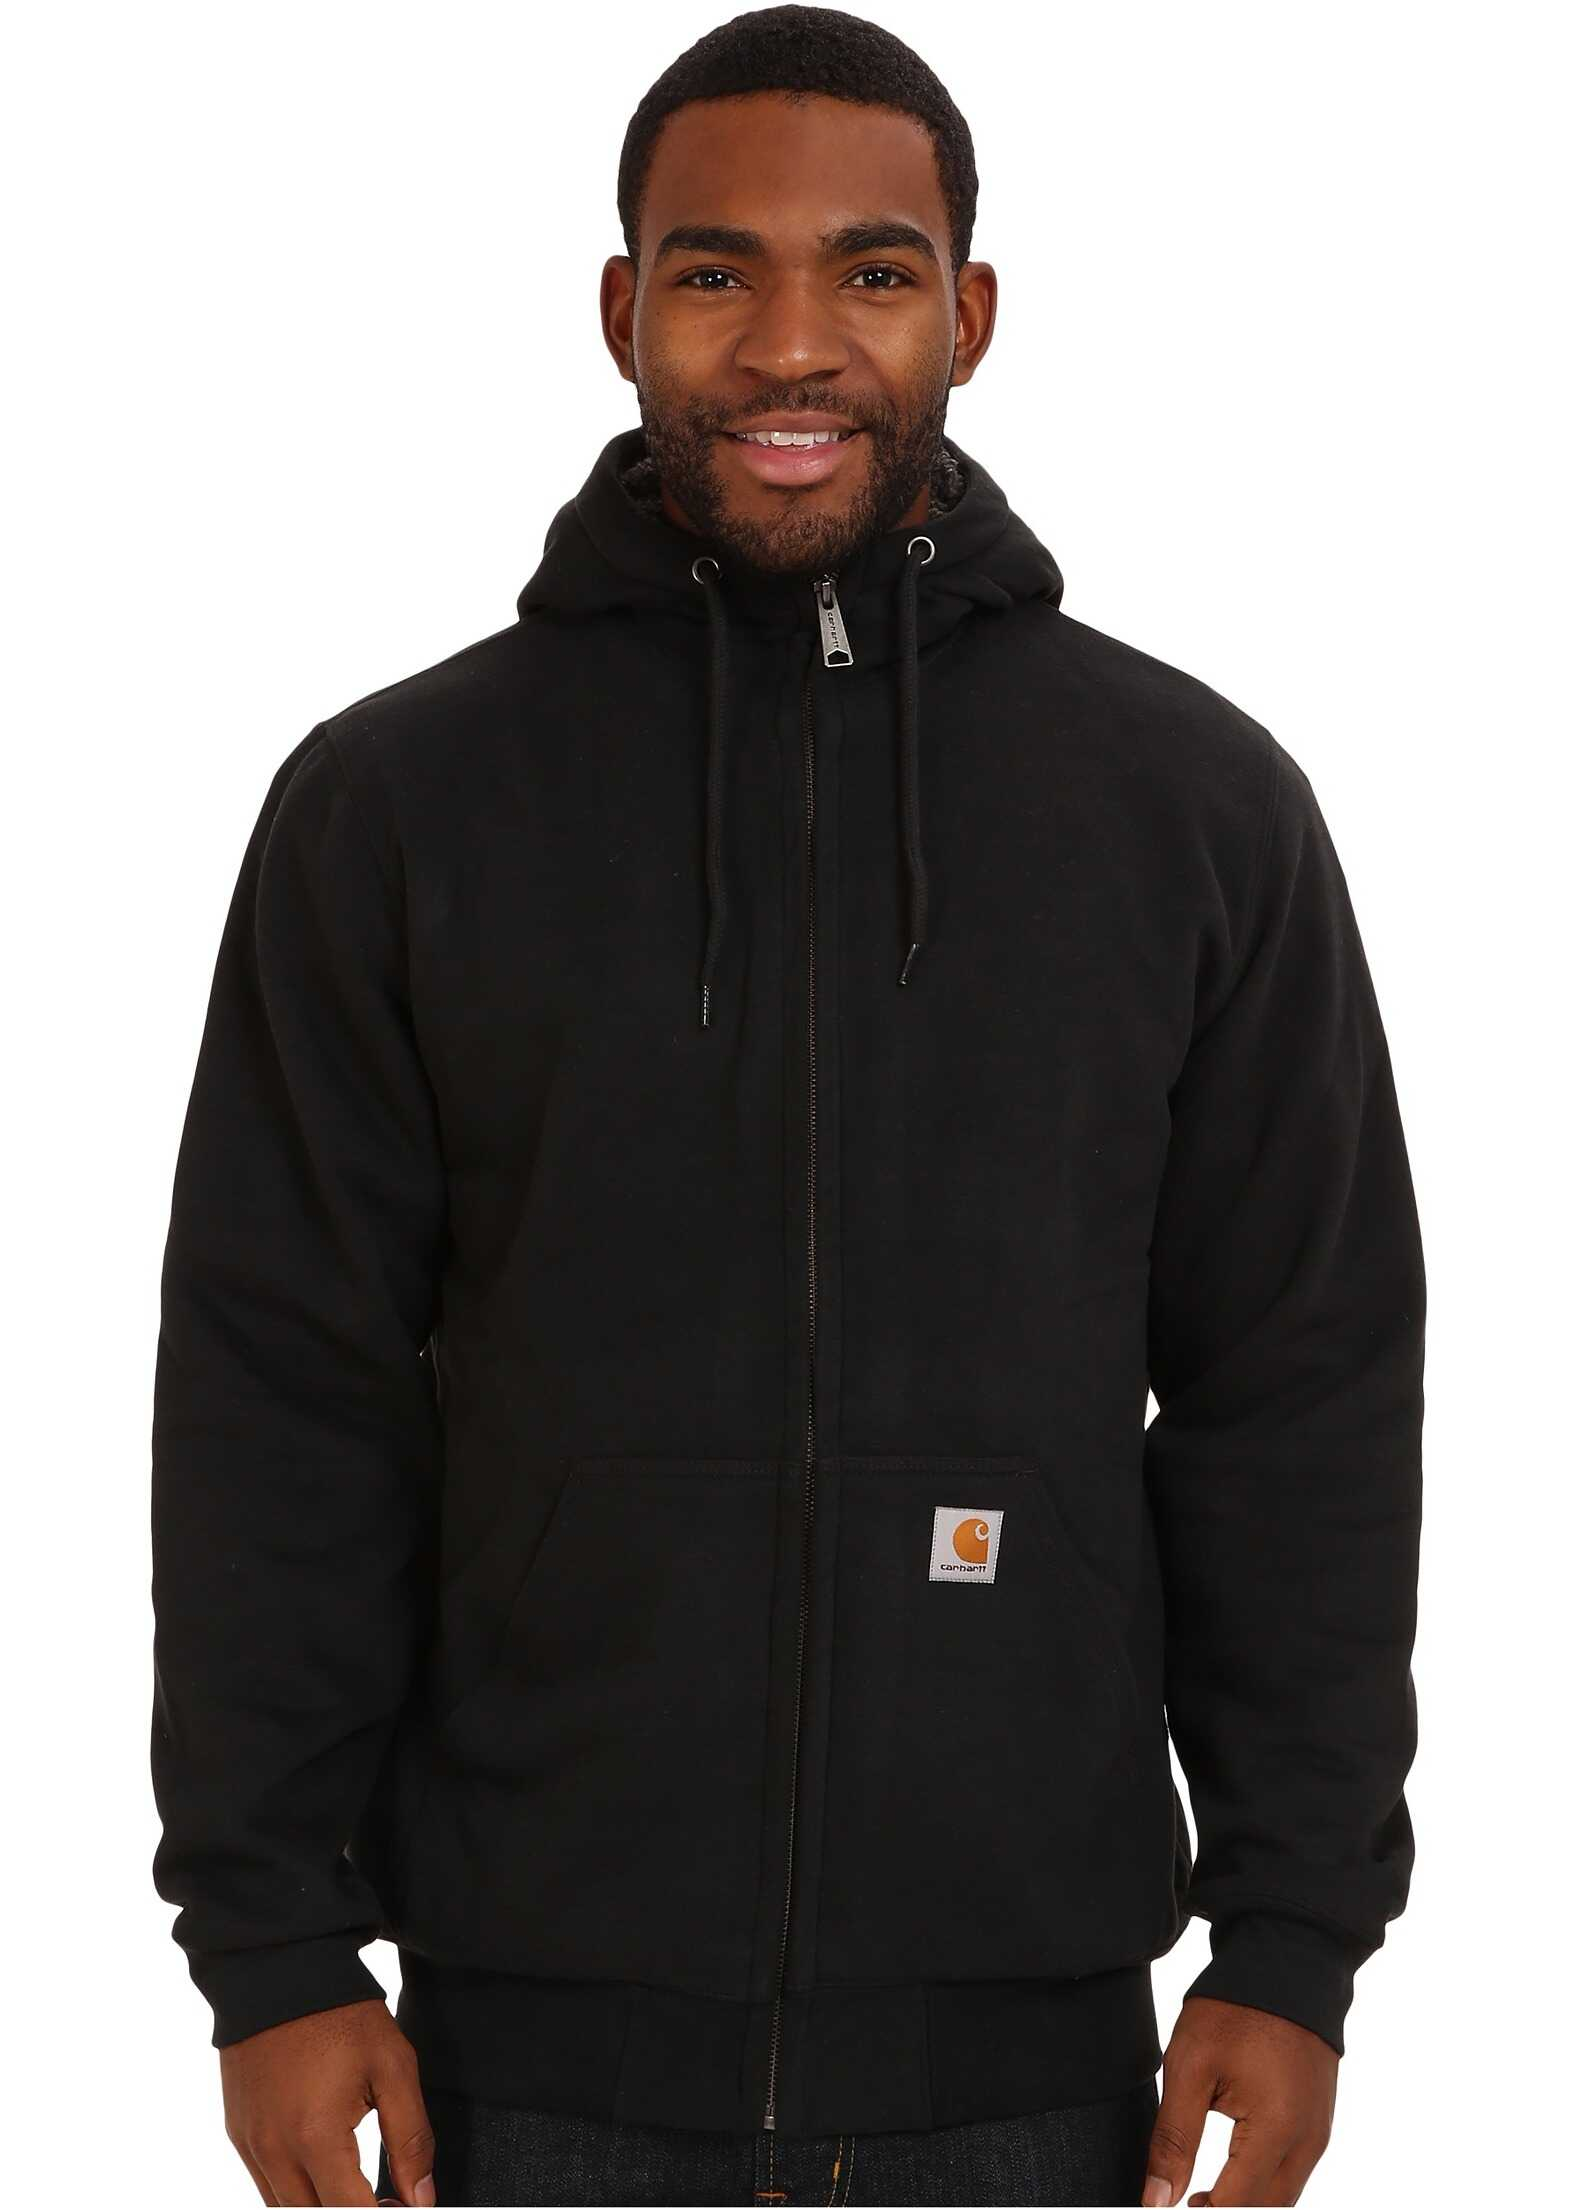 Carhartt Brushed Fleece Sweatshirt Sherpa Lined Black